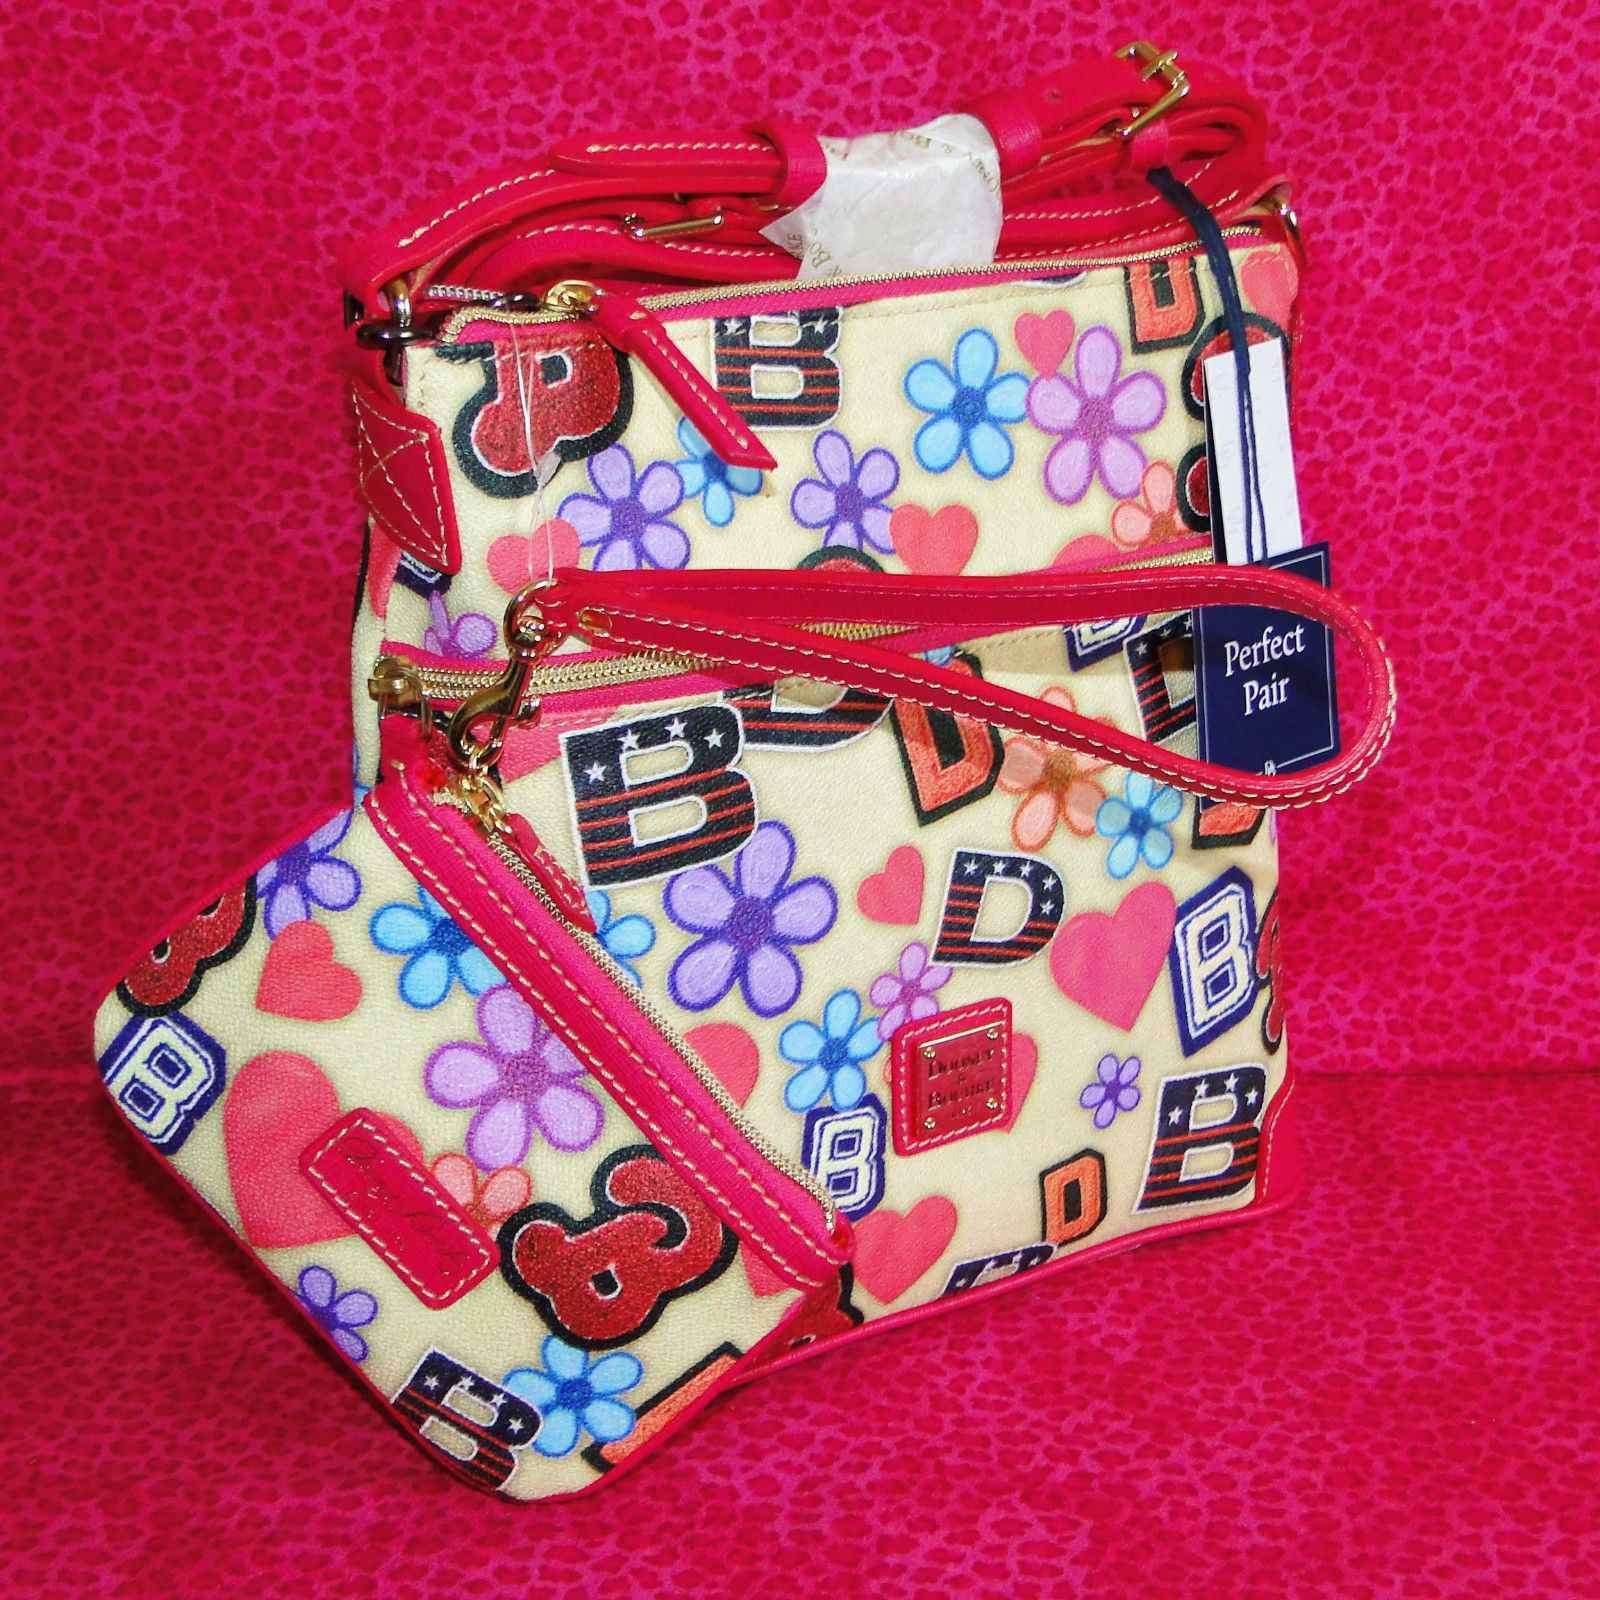 NWT Dooney & Bourke Varsity Crossbody Bag & Med Wristlet Set